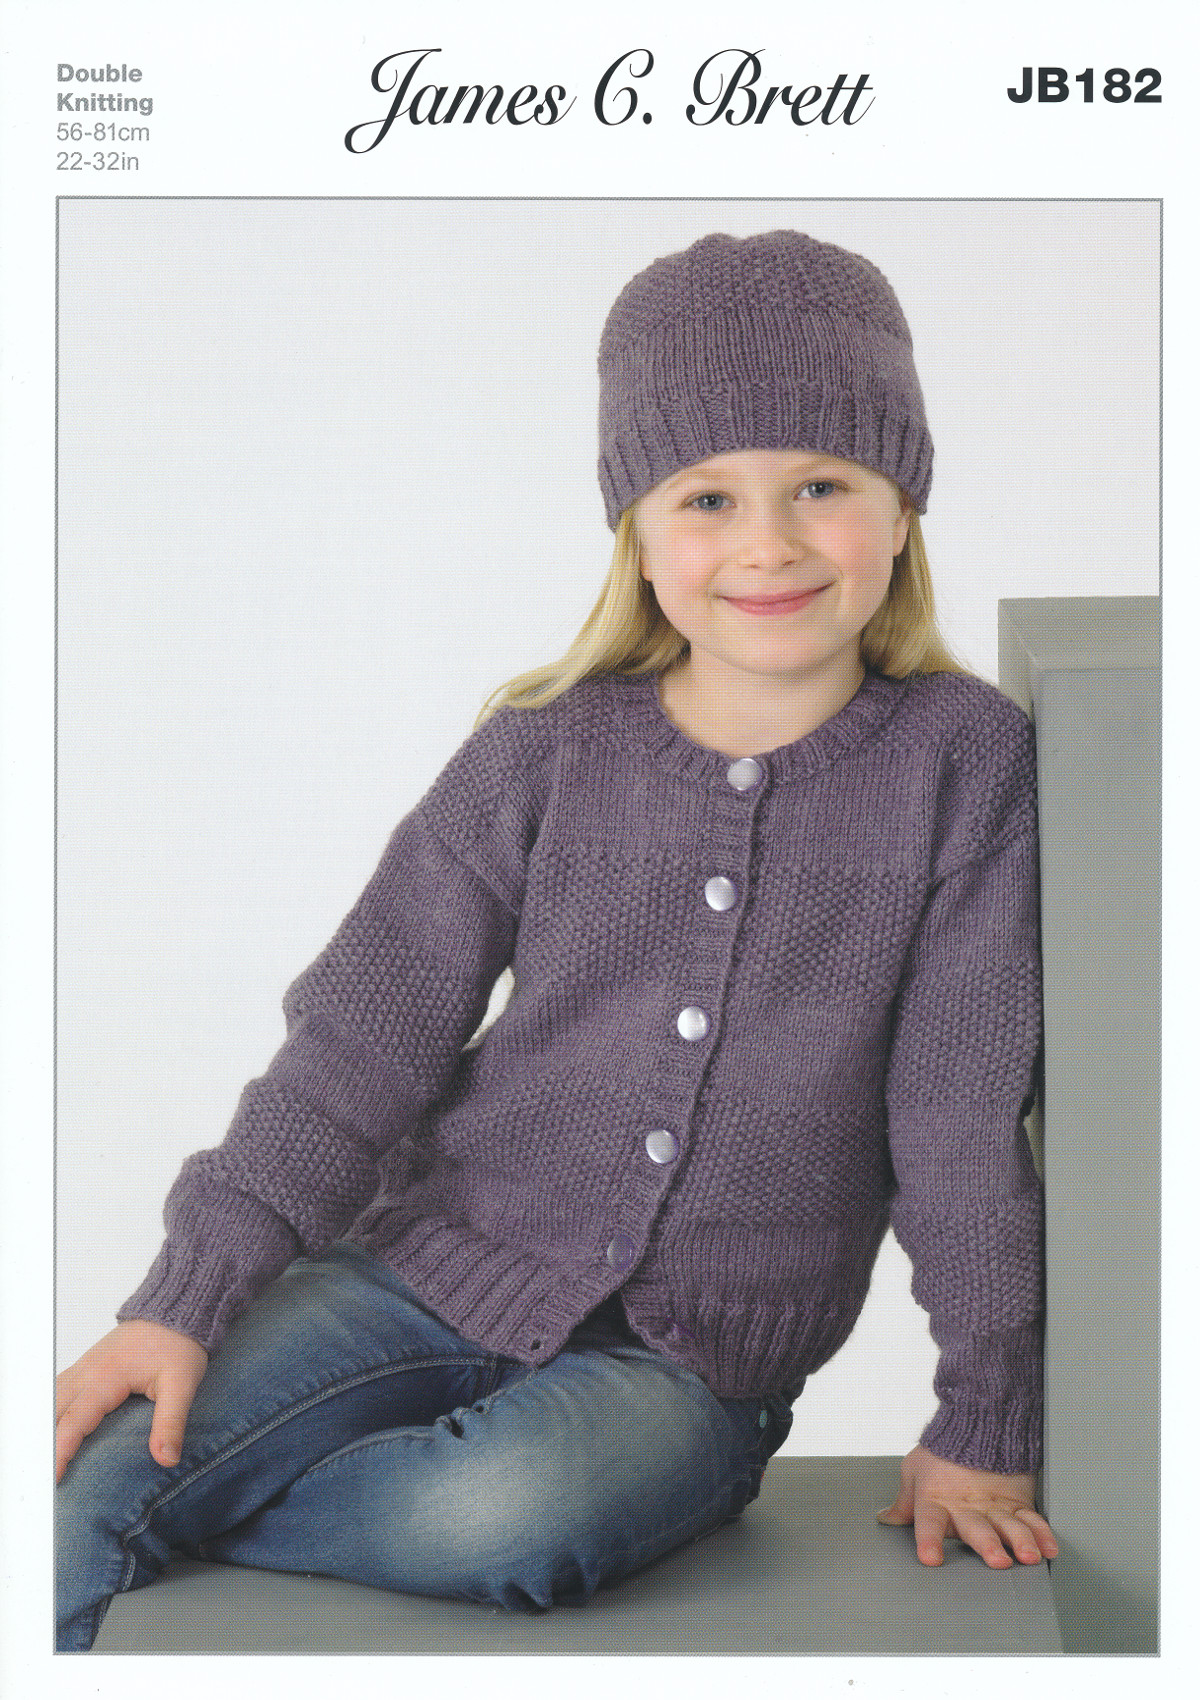 James brett double knitting dk pattern girls round v neck cardigan james brett double knitting dk pattern girls round v neck cardigan hat jb182 bankloansurffo Image collections